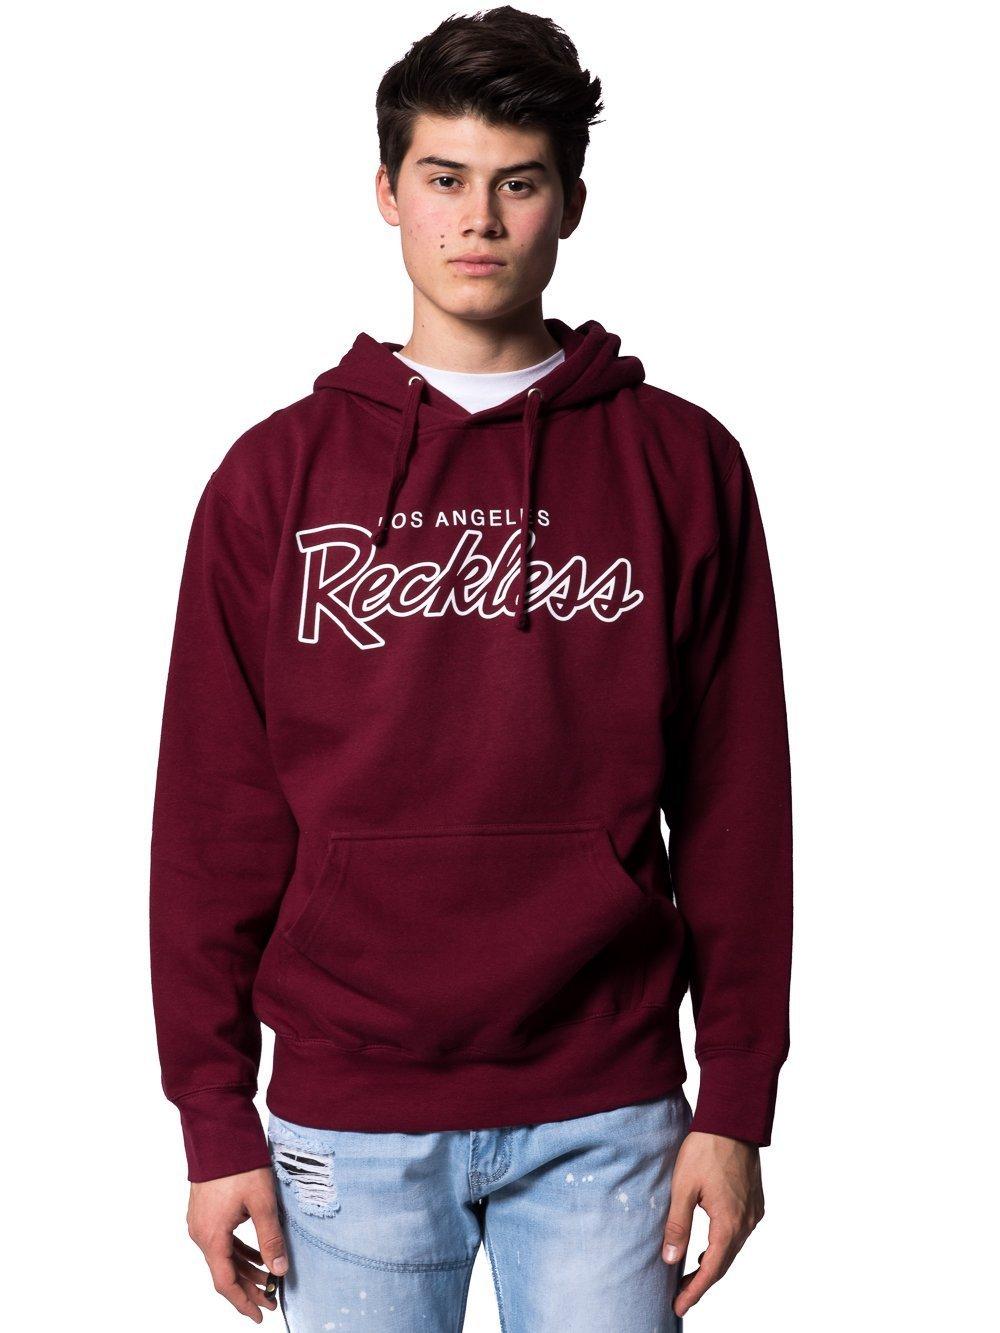 young-and-reckless-mens-tops-hoodies-og-reckless-hoodie-burgundy-1004768788495_2000x.jpg